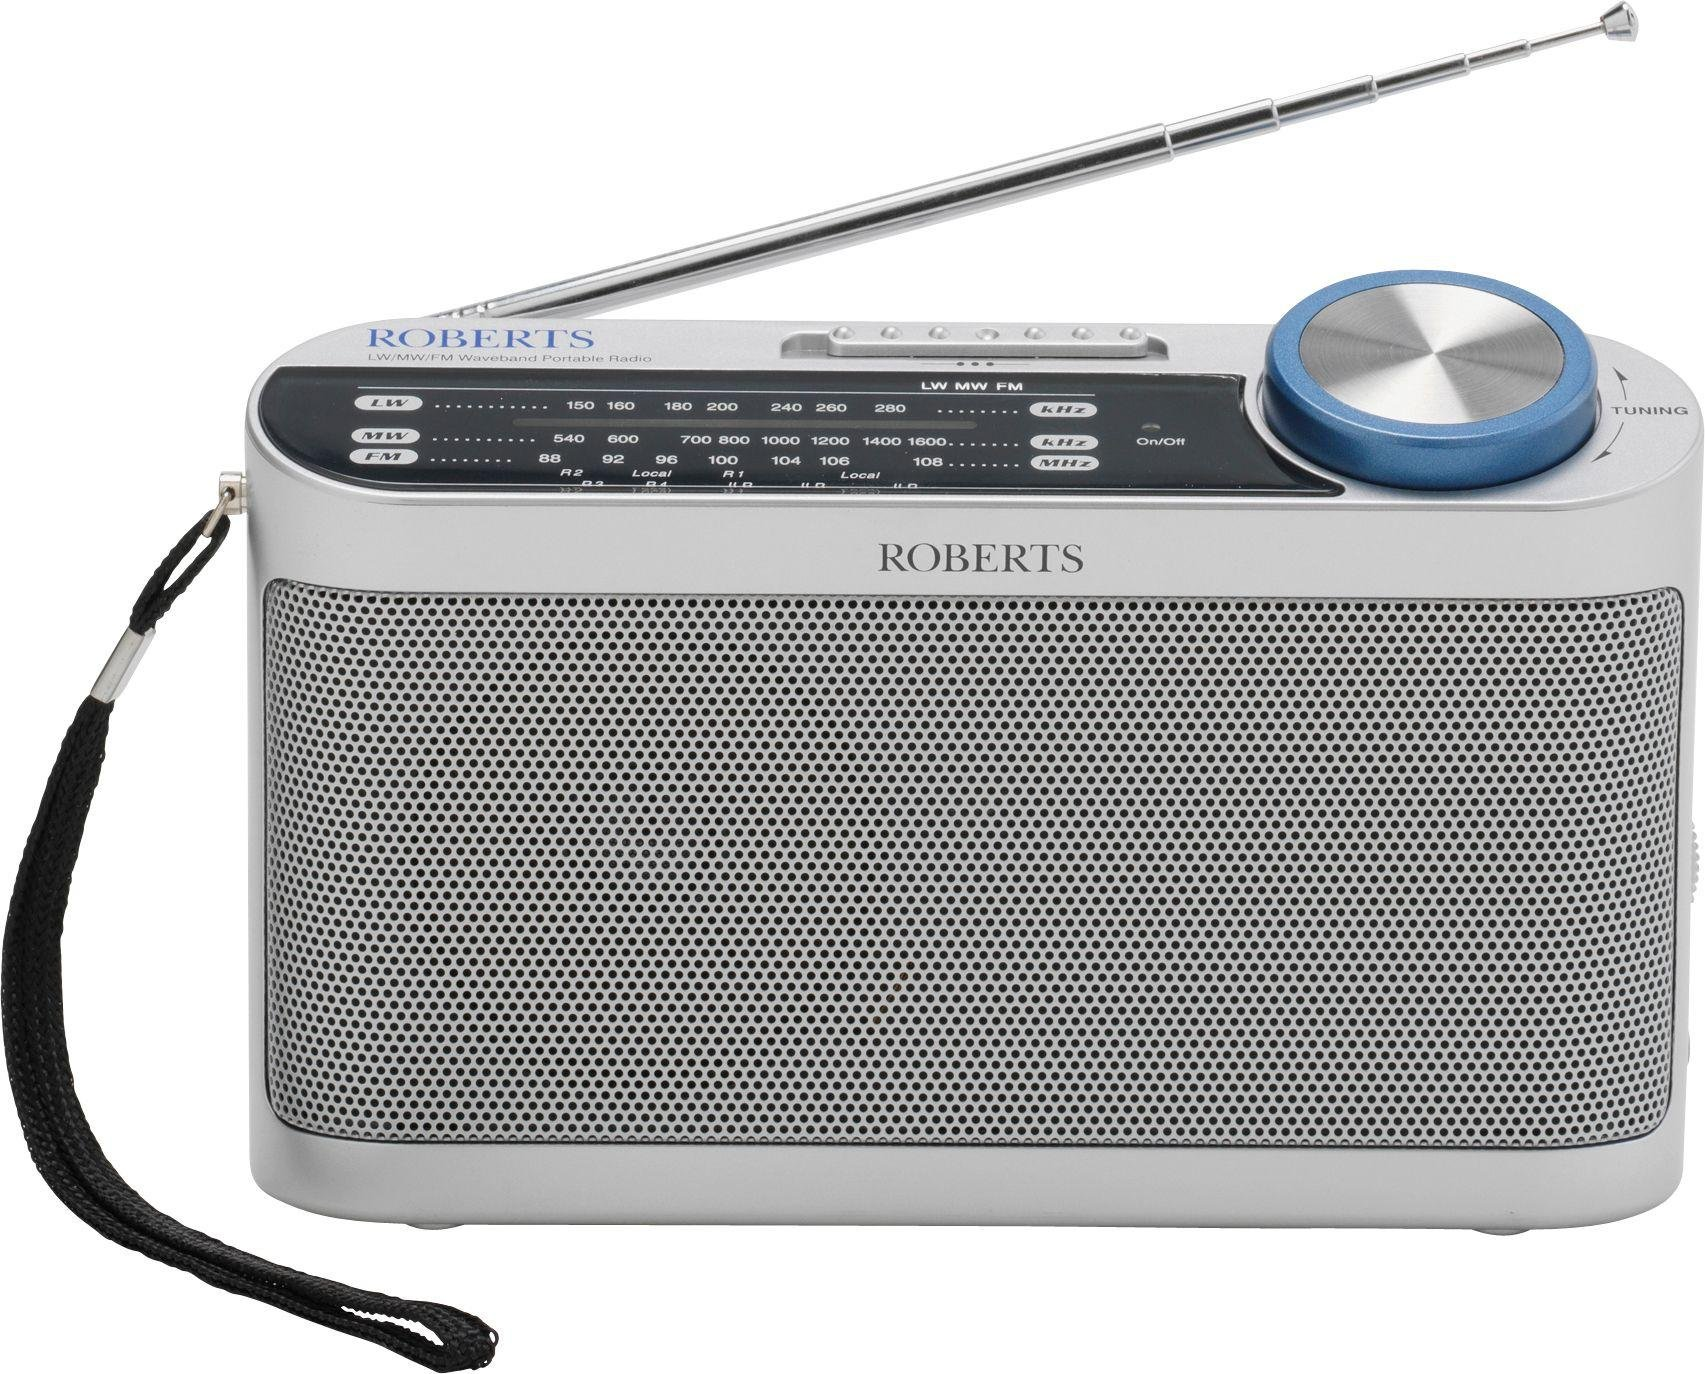 Roberts - Portable Radio - Silver